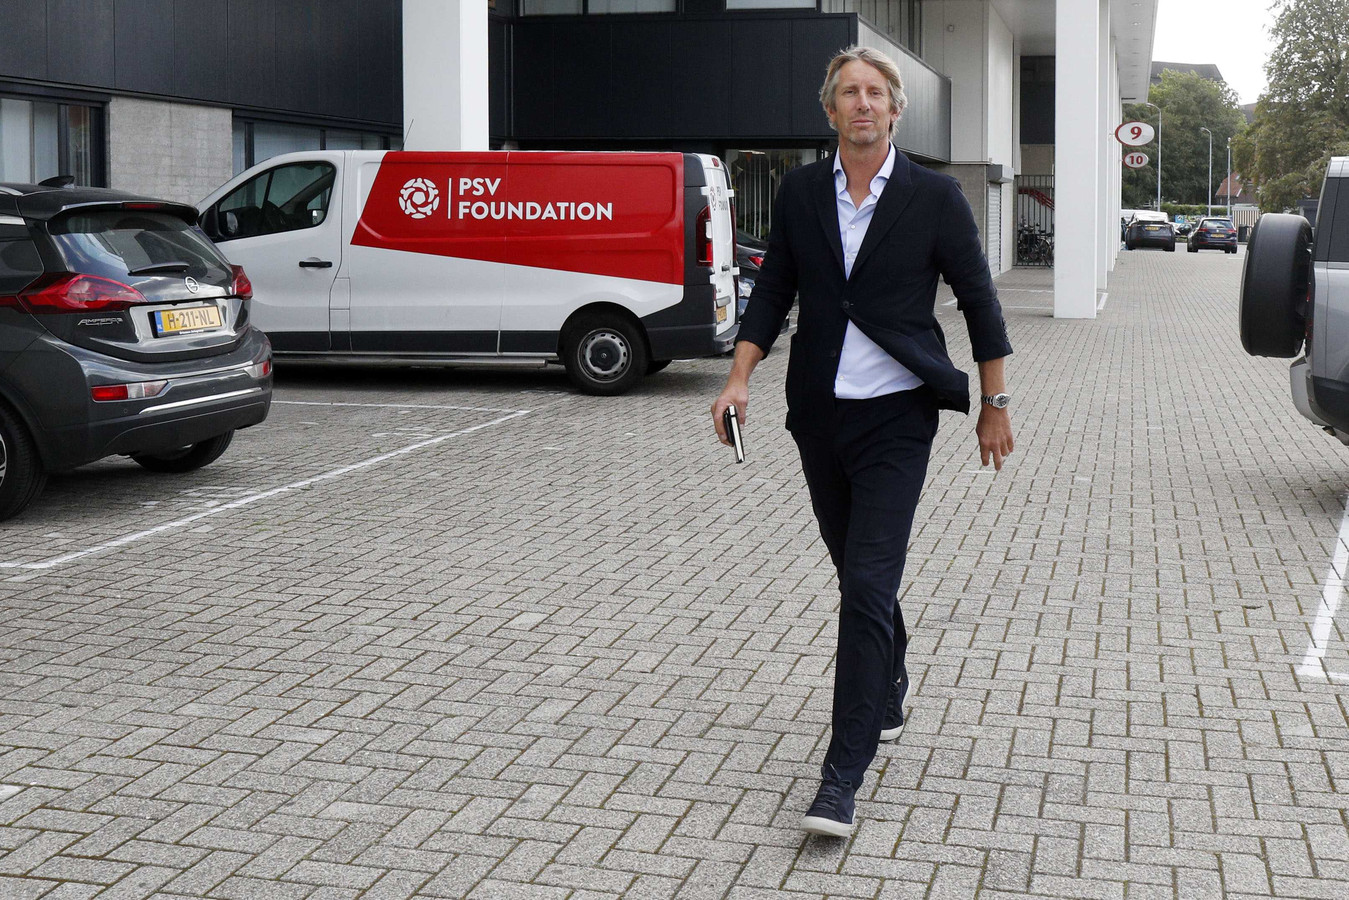 Edwin van der Sar (Ajax).